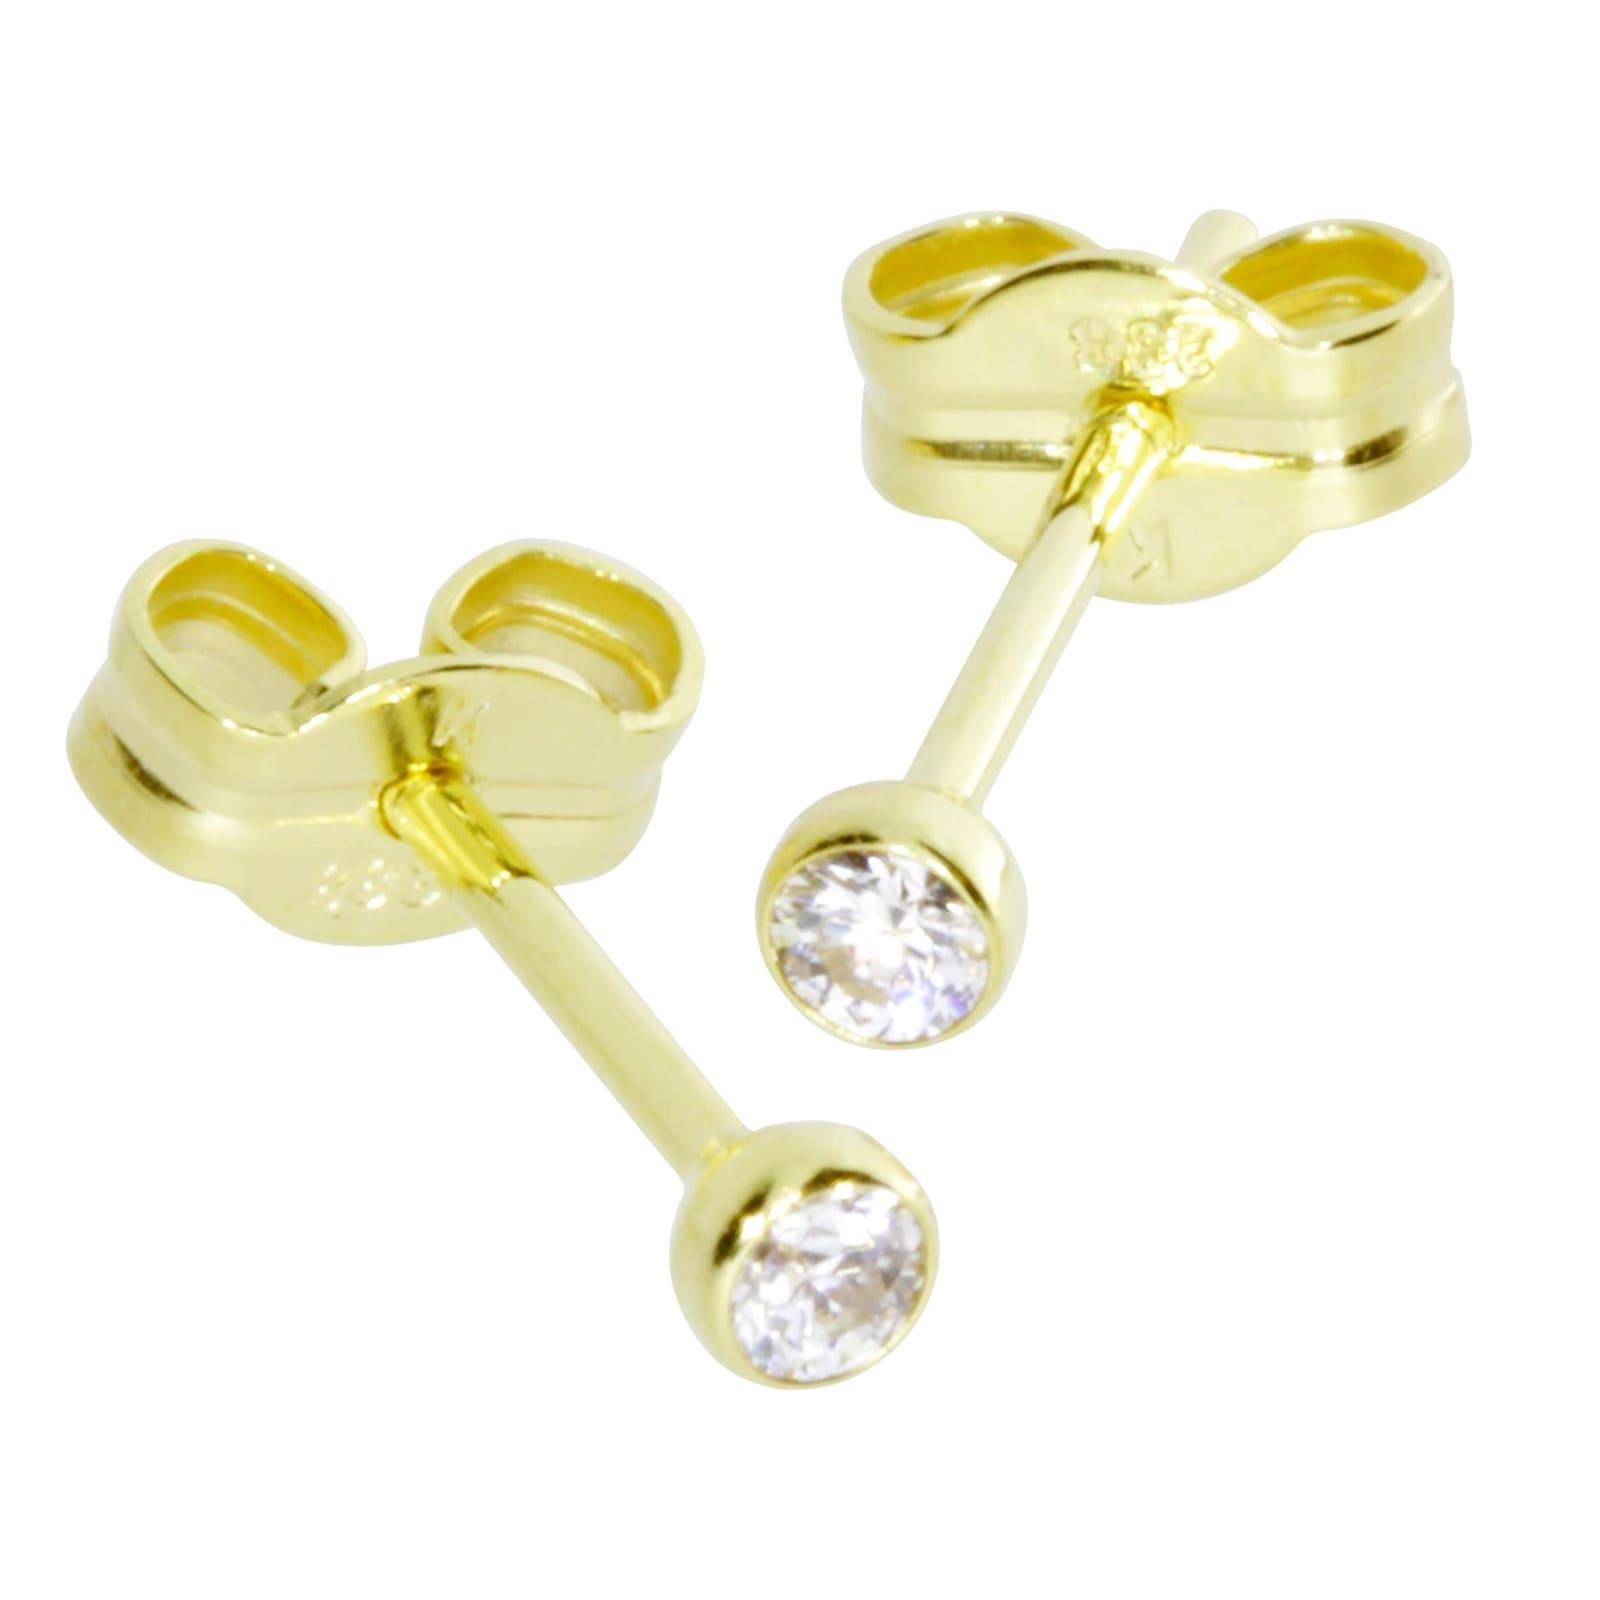 OSTSEE-SCHMUCK Paar Ohrstecker Anna 2 mm Gold 333/000 Zirkonia weiss | Schmuck > Ohrschmuck & Ohrringe > Ohrstecker | Ostsee-Schmuck